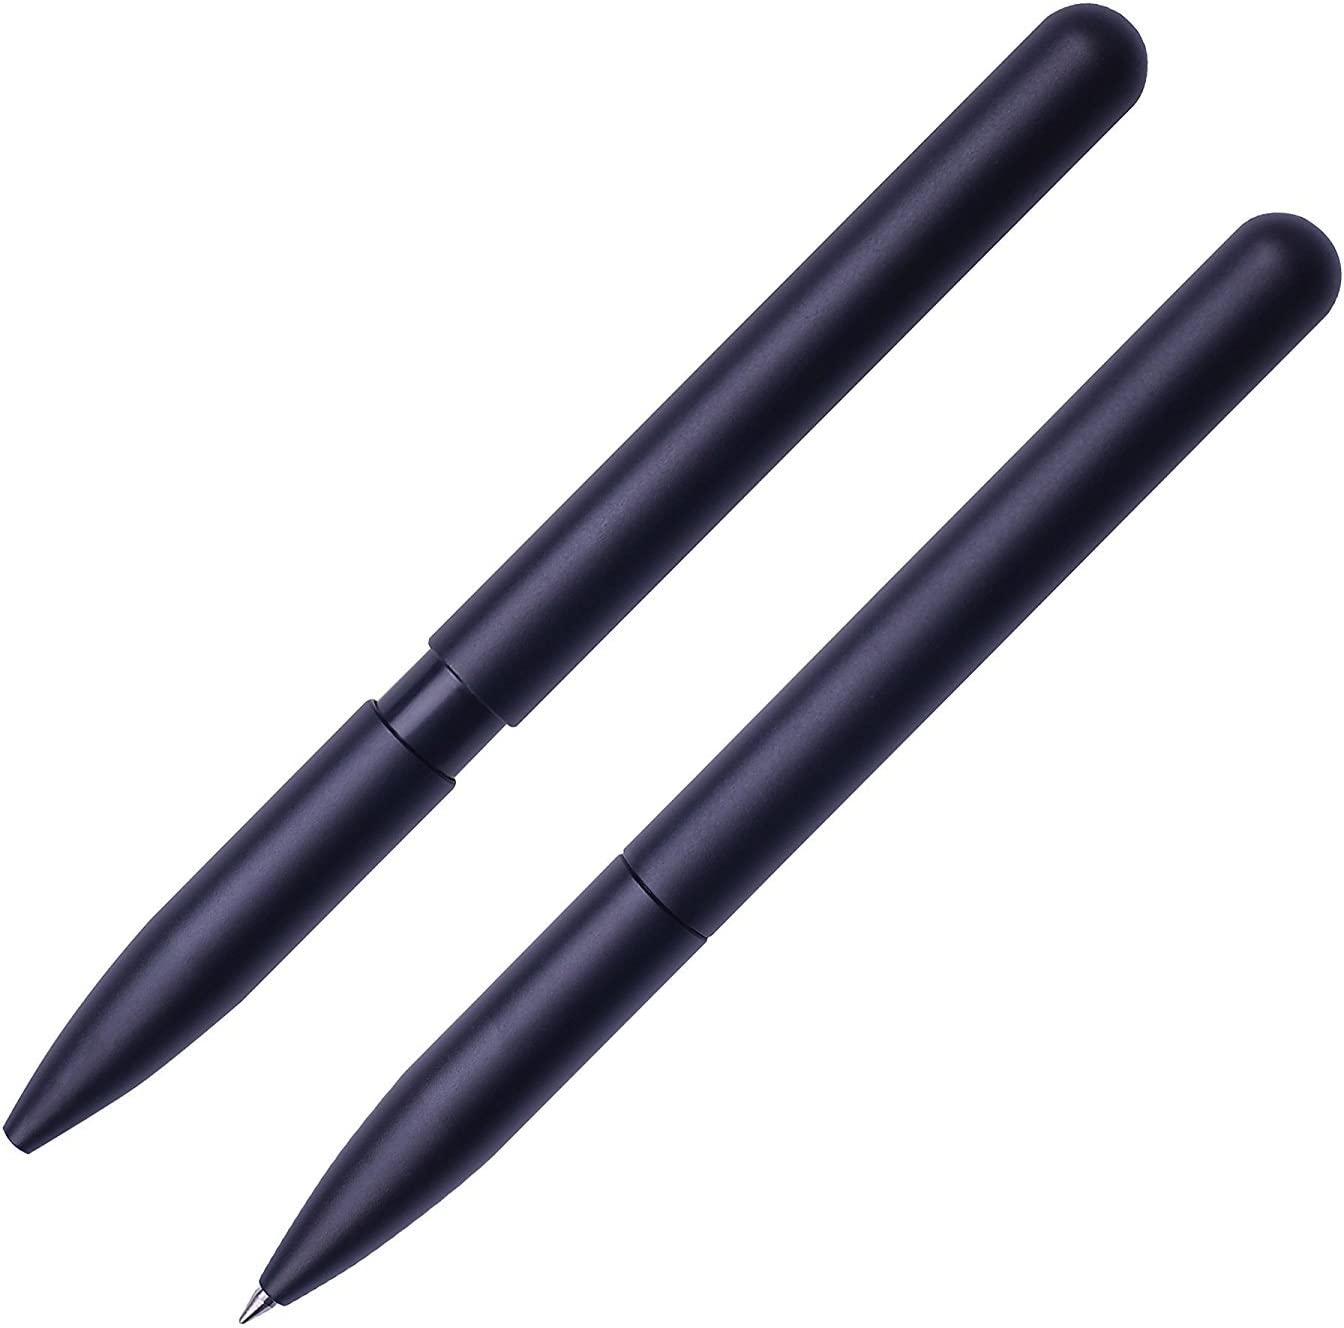 Pentel BL2007CABX EnerGel Style Gel Pen, Navy 0.7mm Medium Line